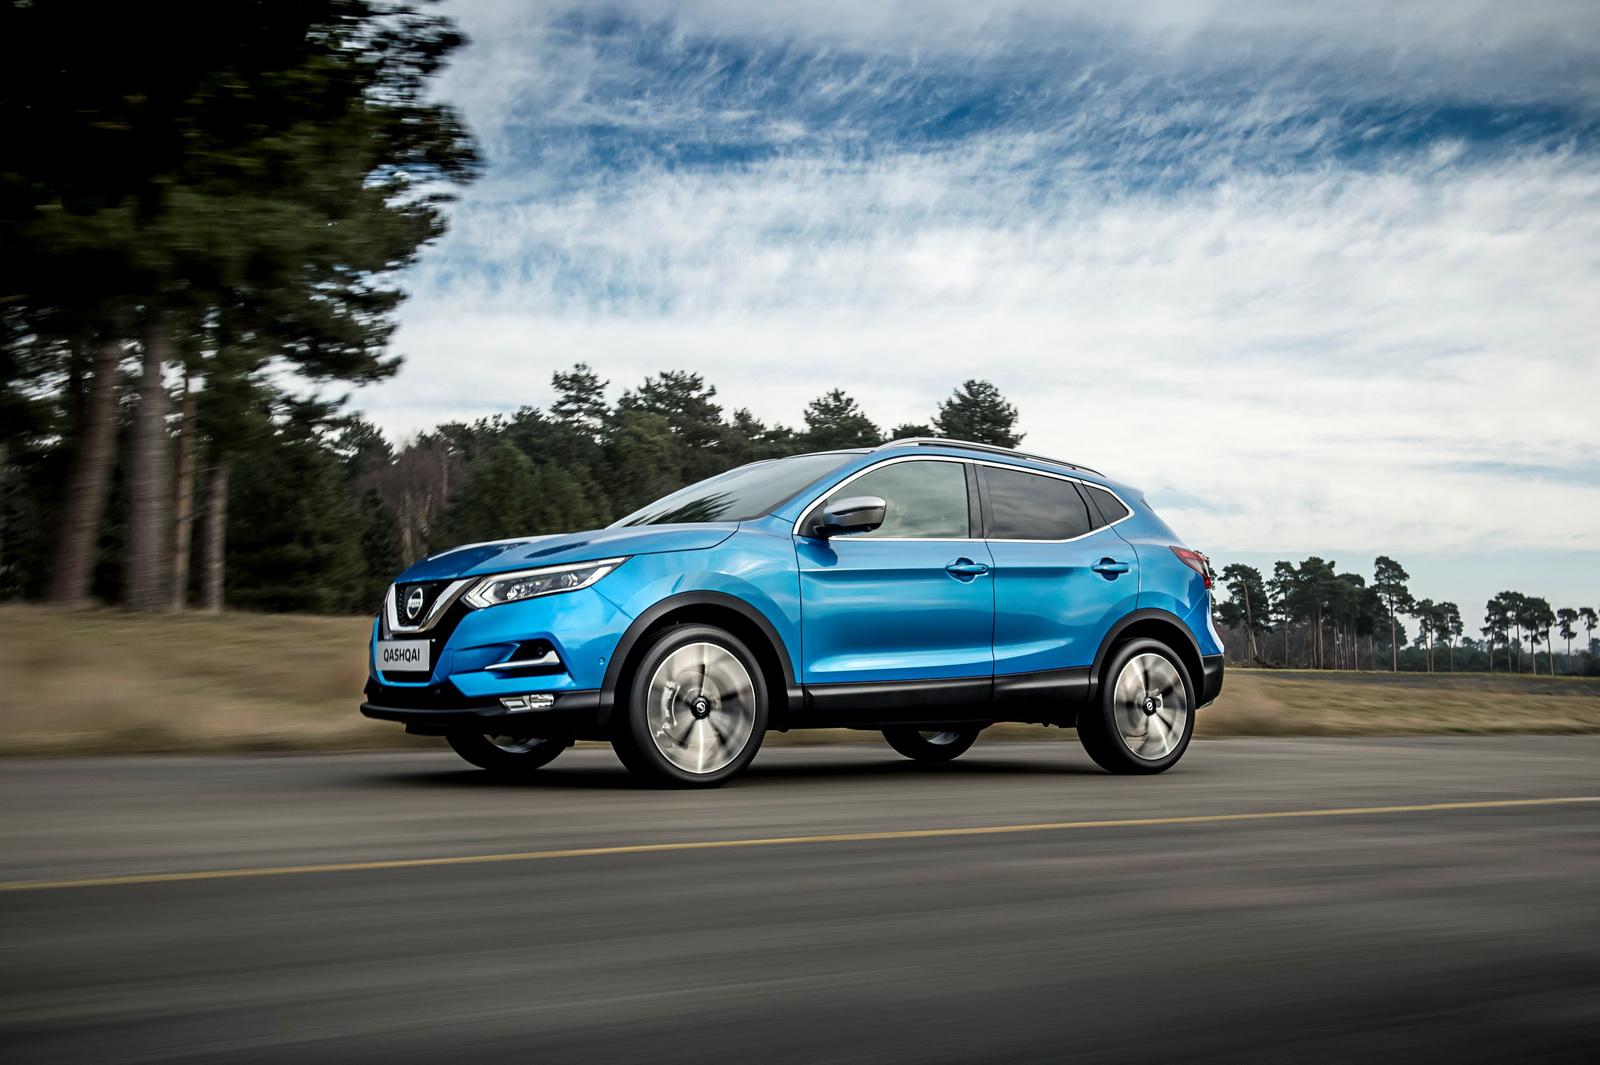 Nowy Nissan Qashqai Facelift 2017